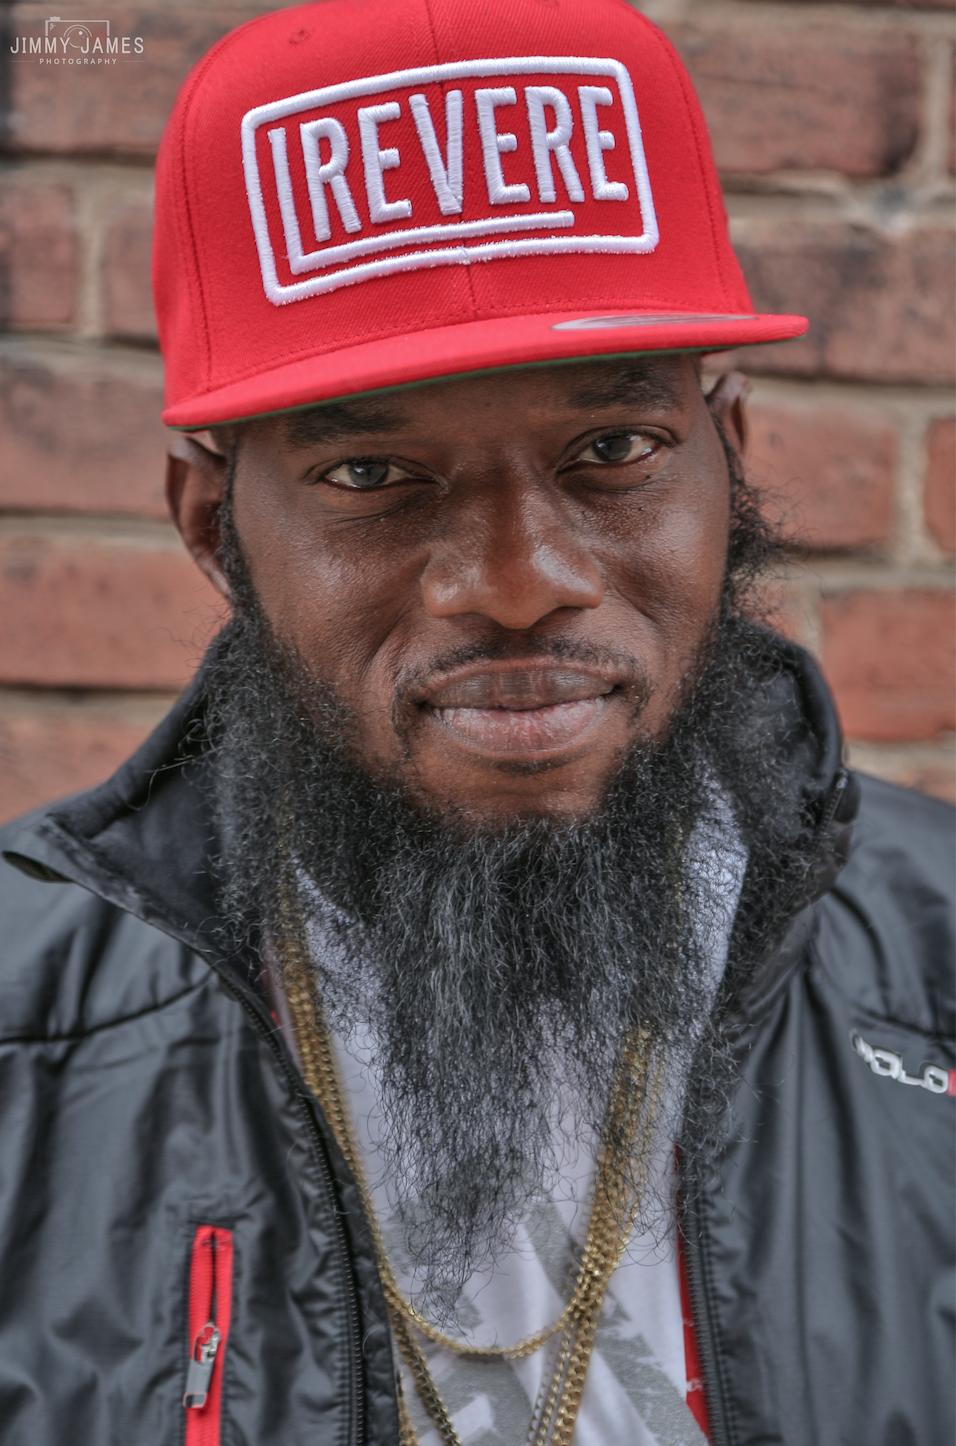 Freeway (rapper) - Wikipedia